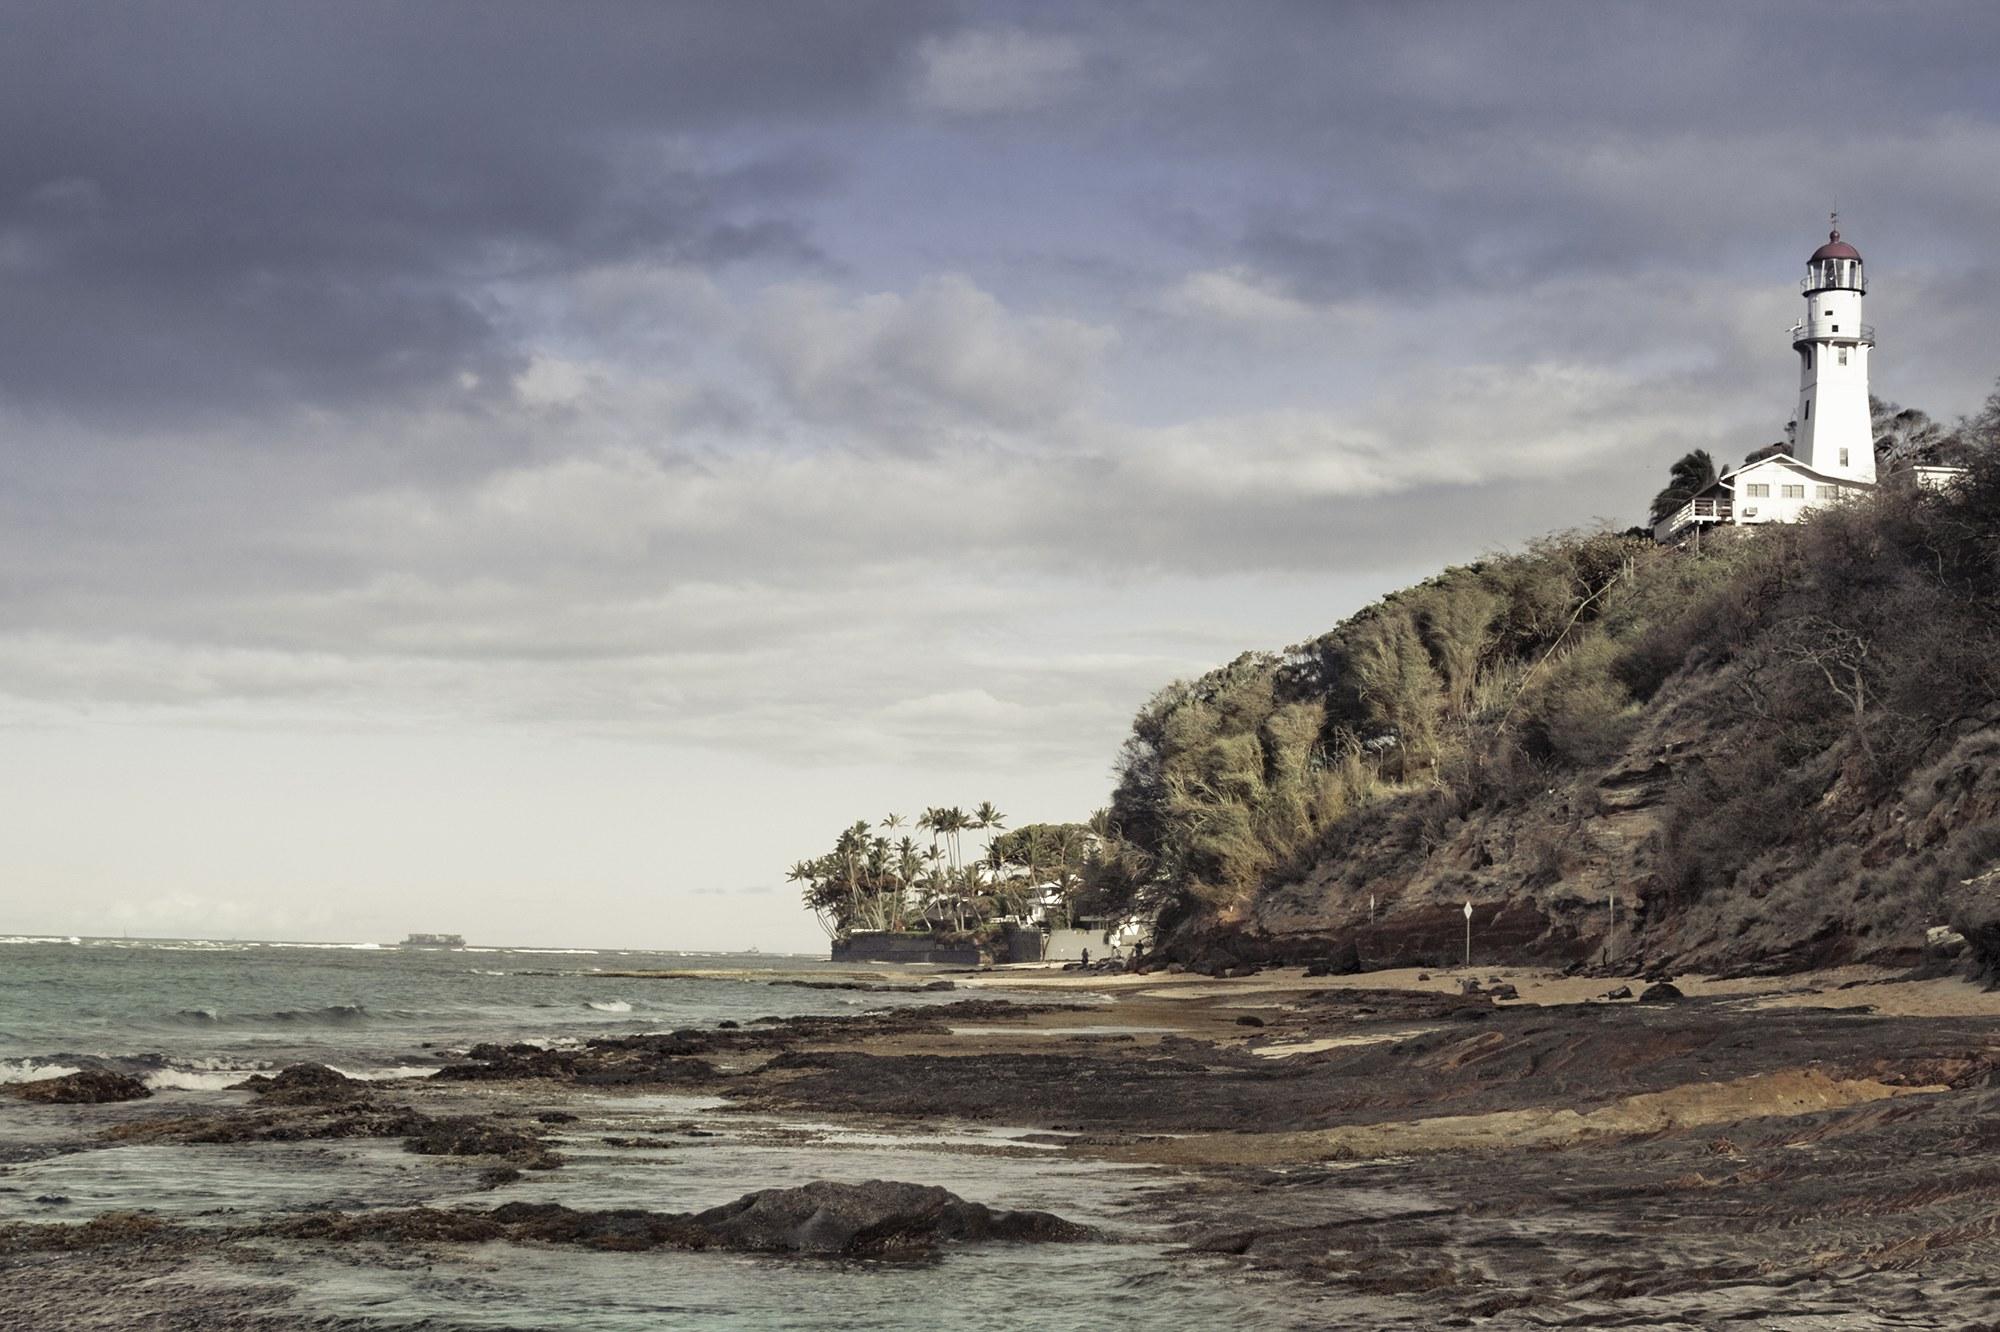 Oahu Lighthouse Hikes, Trails and Map | Hawaii Photography Tours